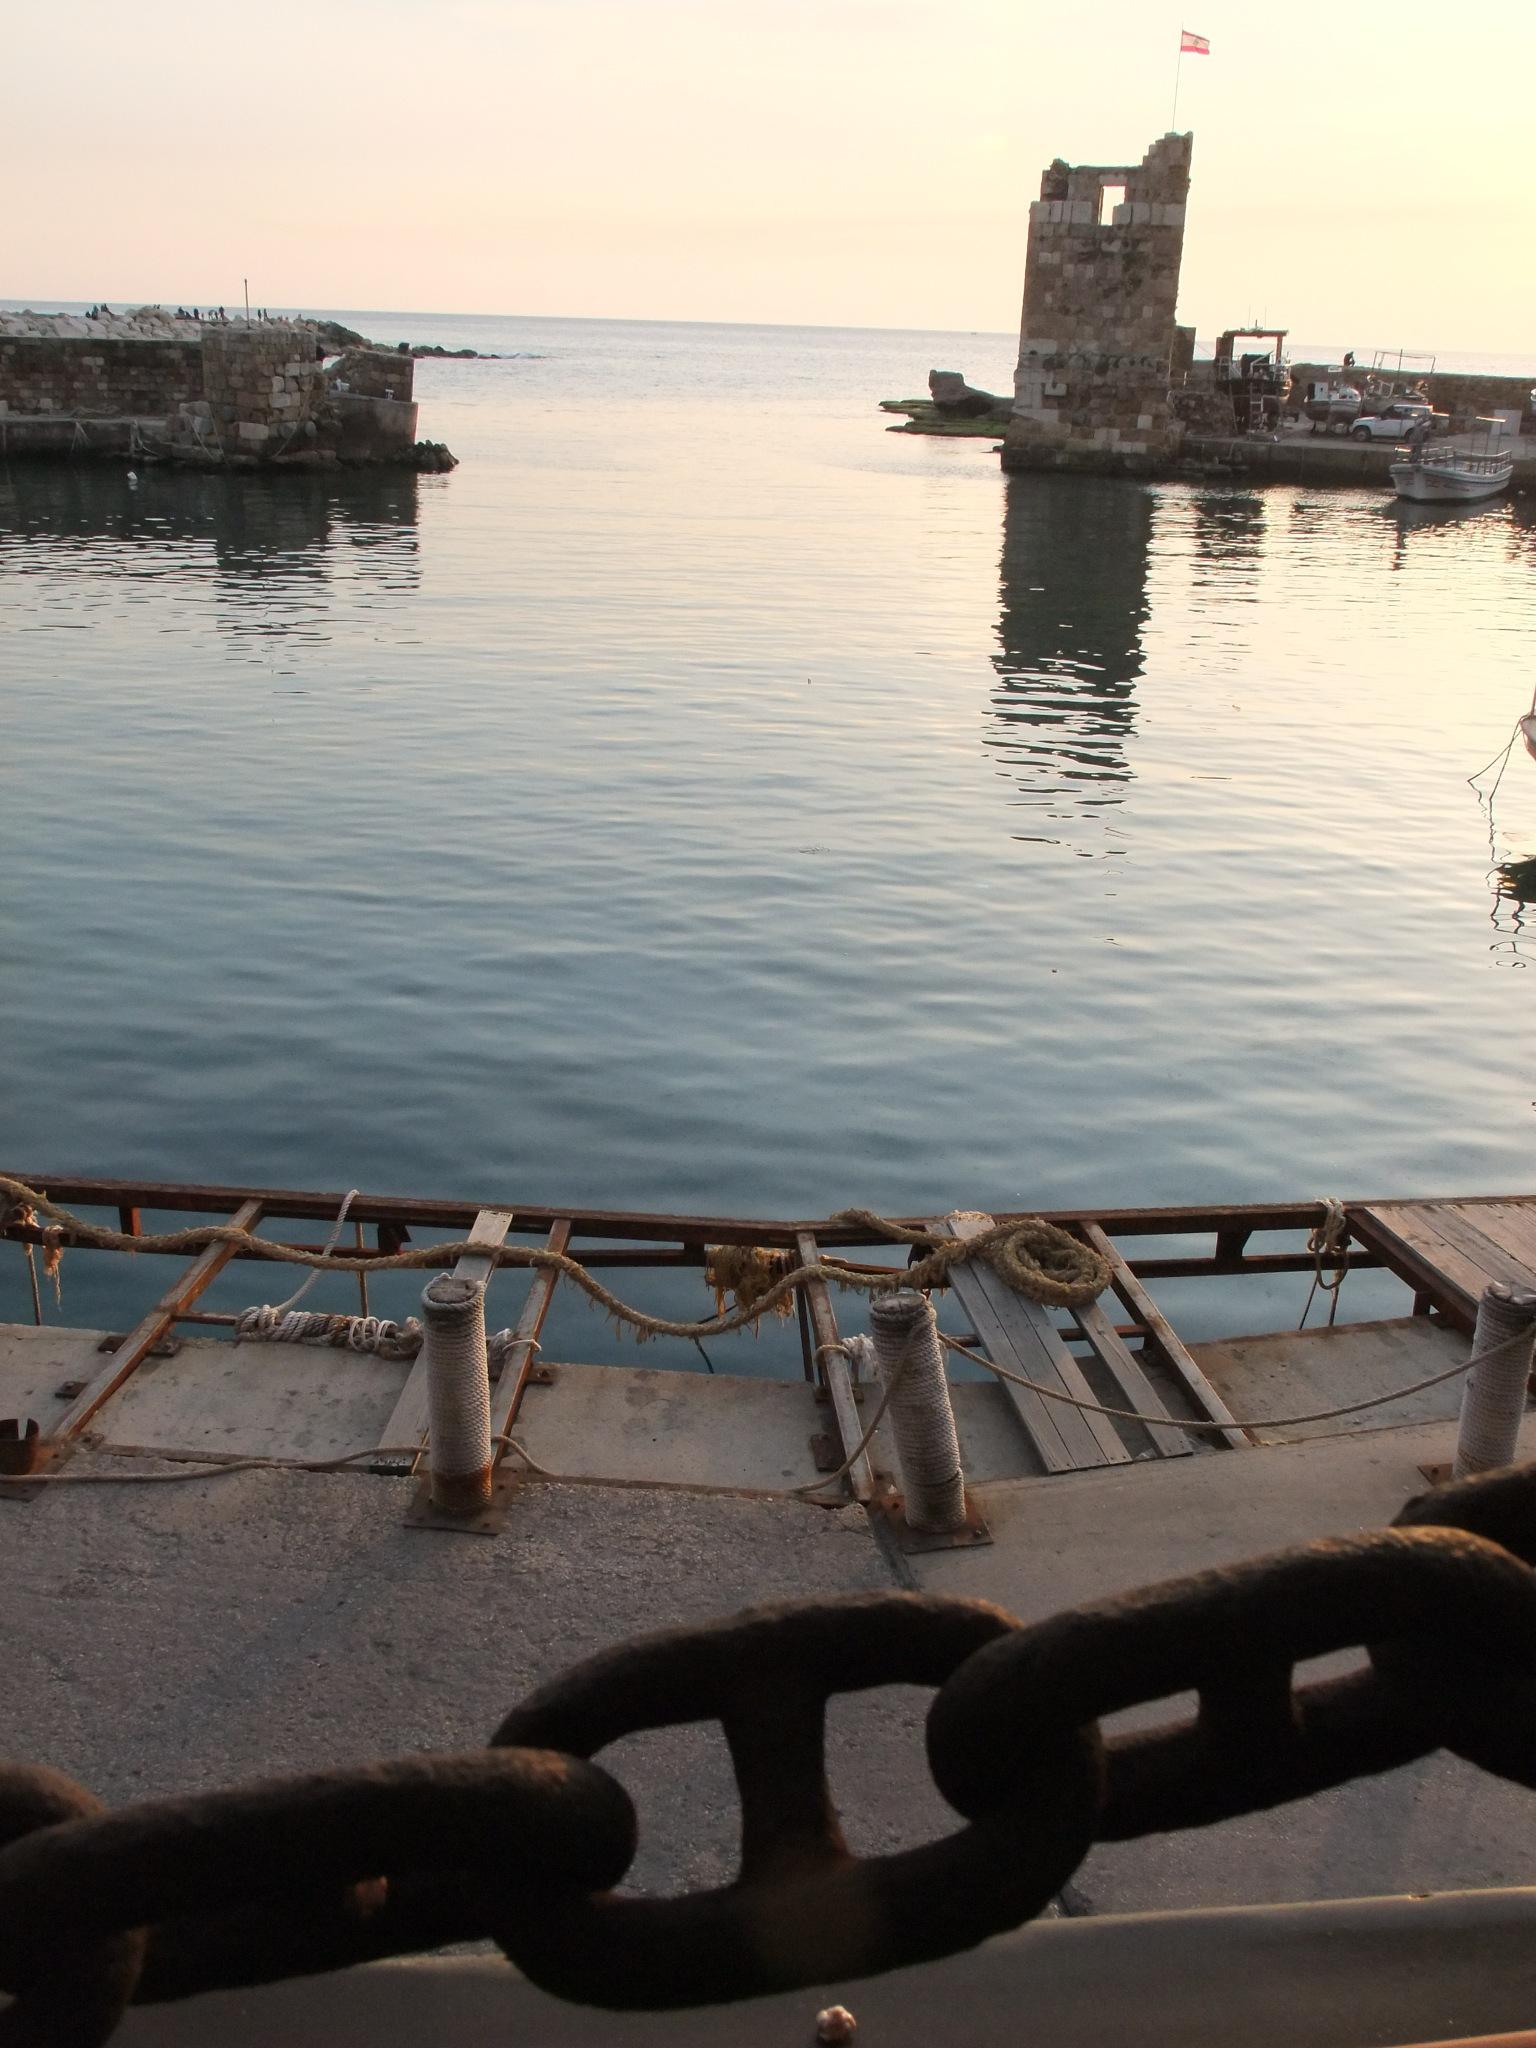 Byblos, Liban by Giselle El Raheb